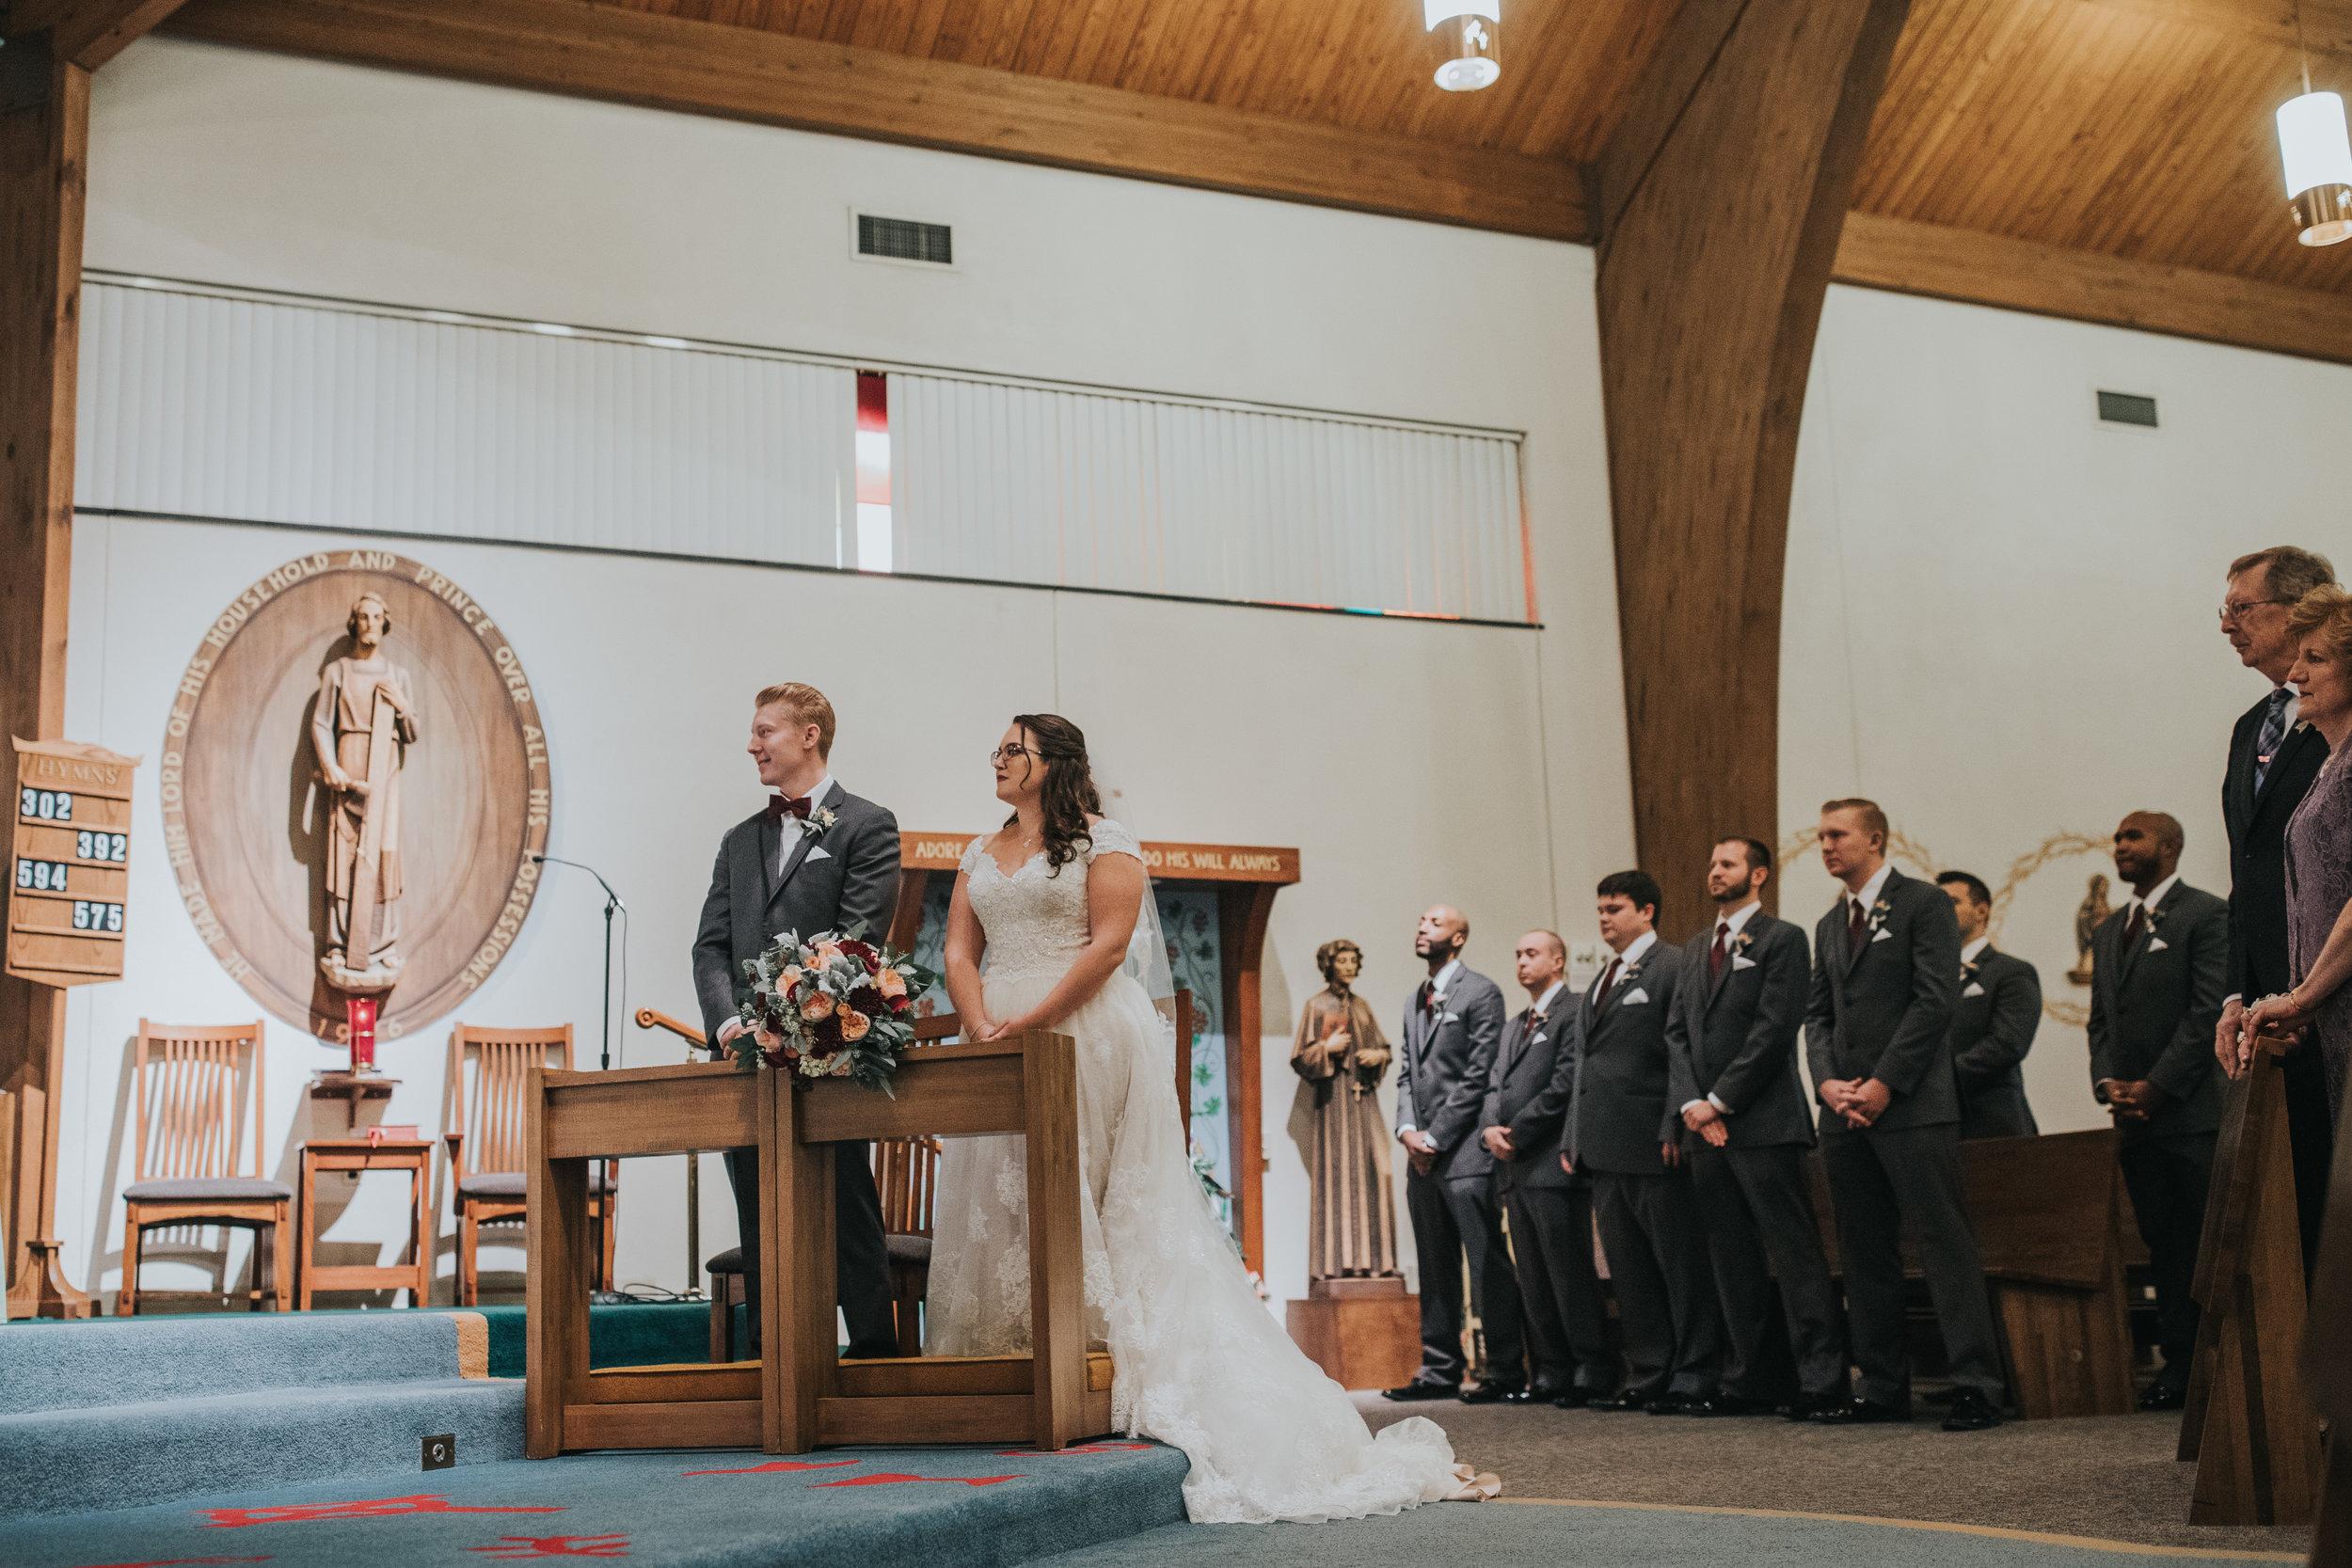 New-Jersey-Wedding-Photography-Fishers-Tudor-House-JennaLynnPhotography-Ceremony-Kathleen&Eddie-23.jpg